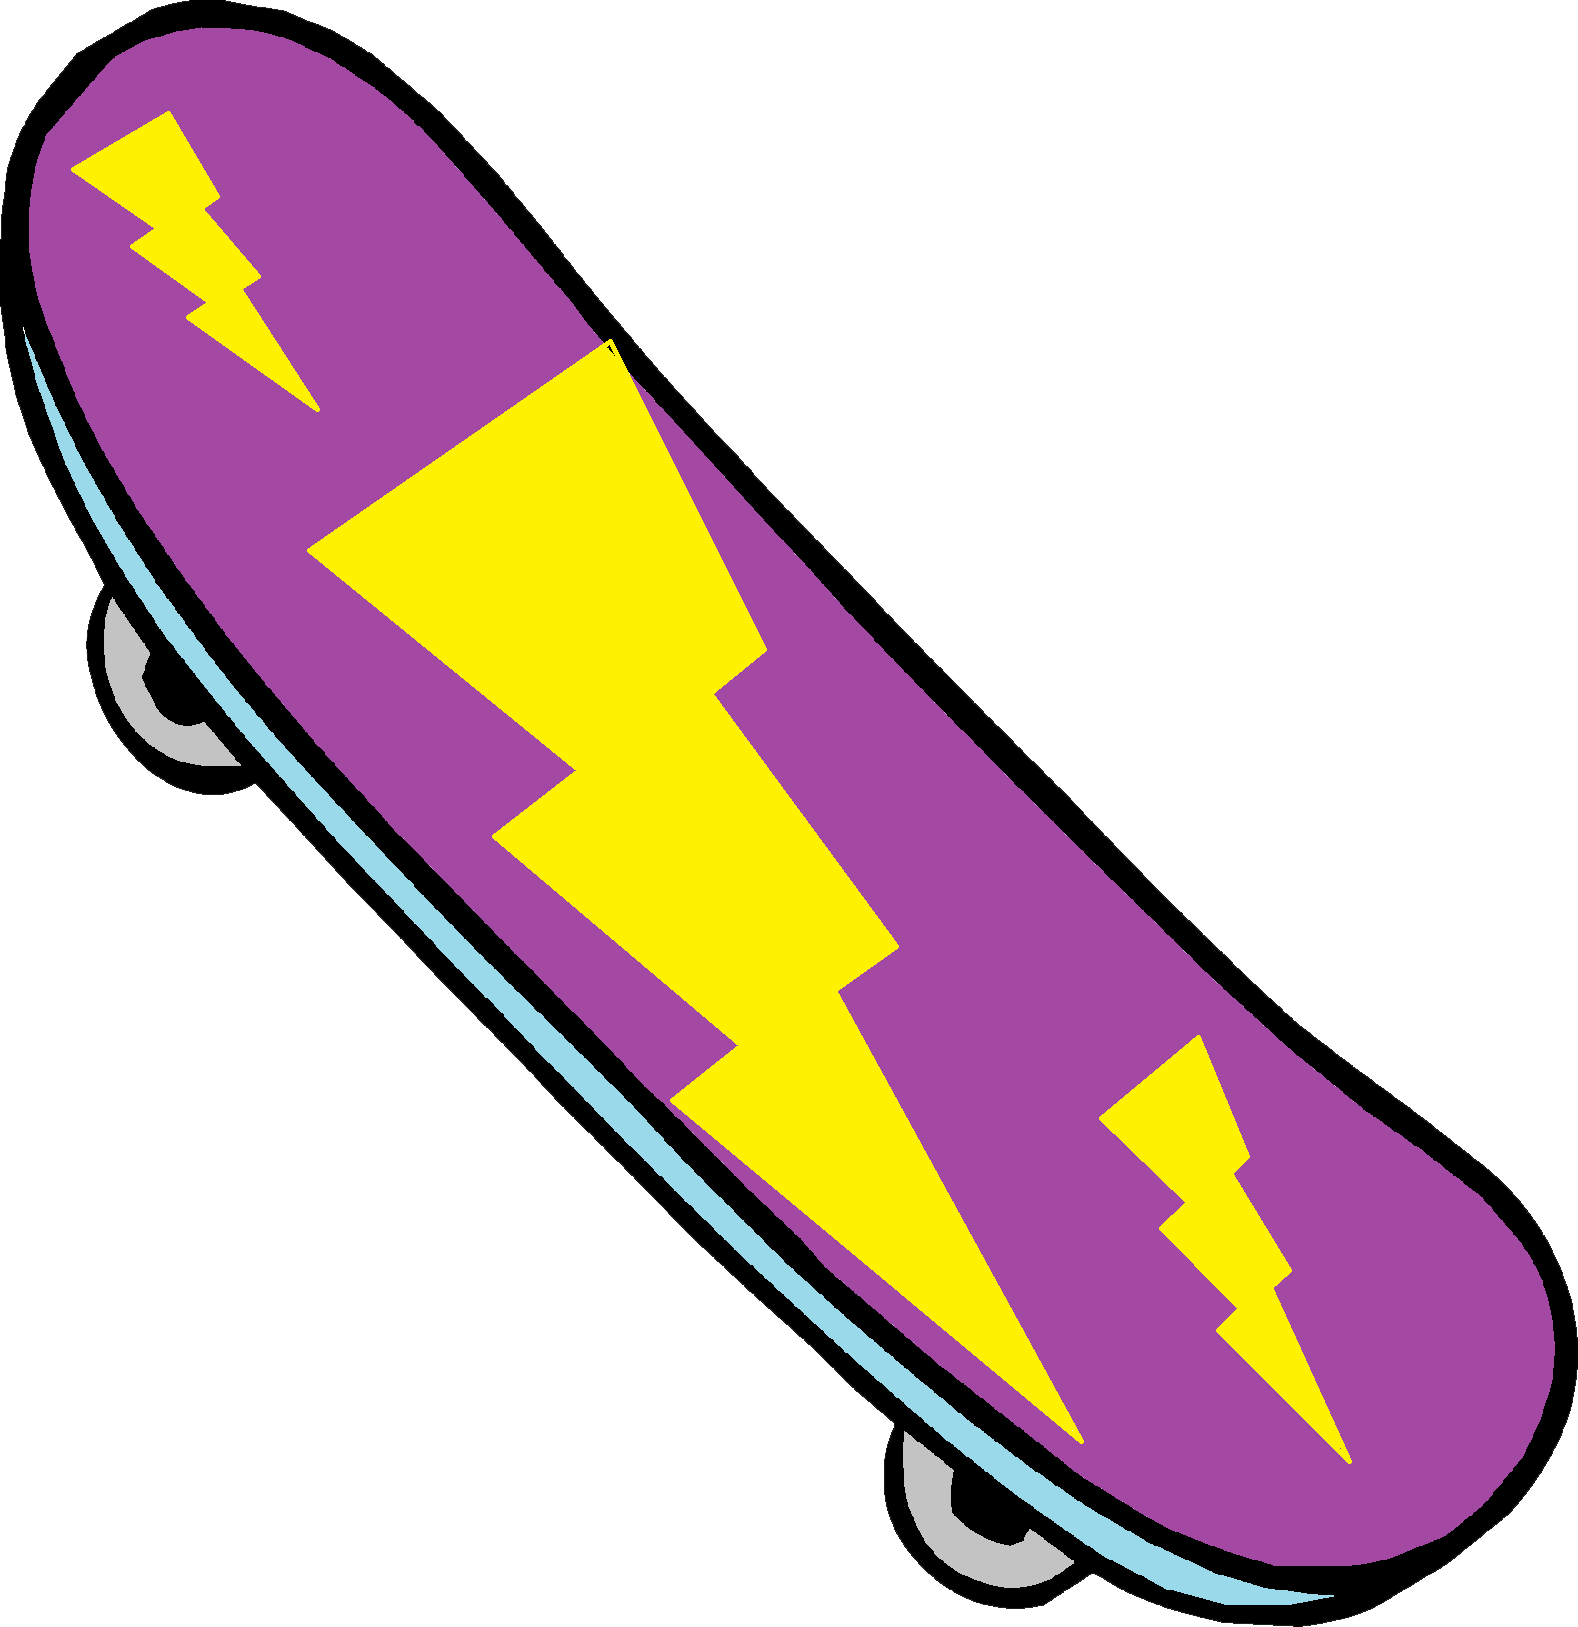 Skateboard PNG Clipart